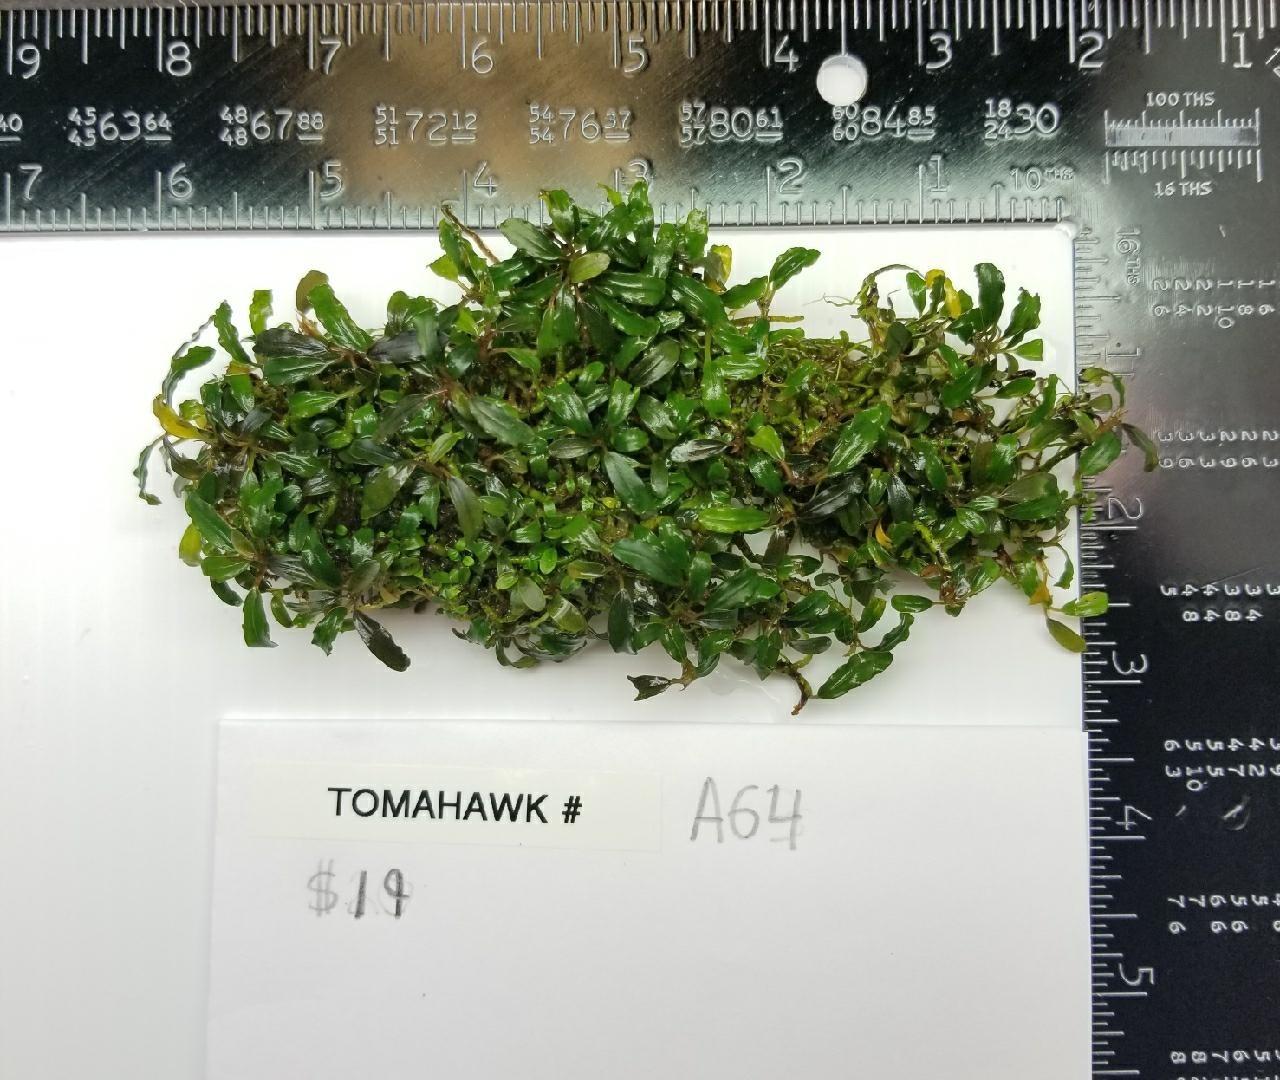 Tomahawk Buce